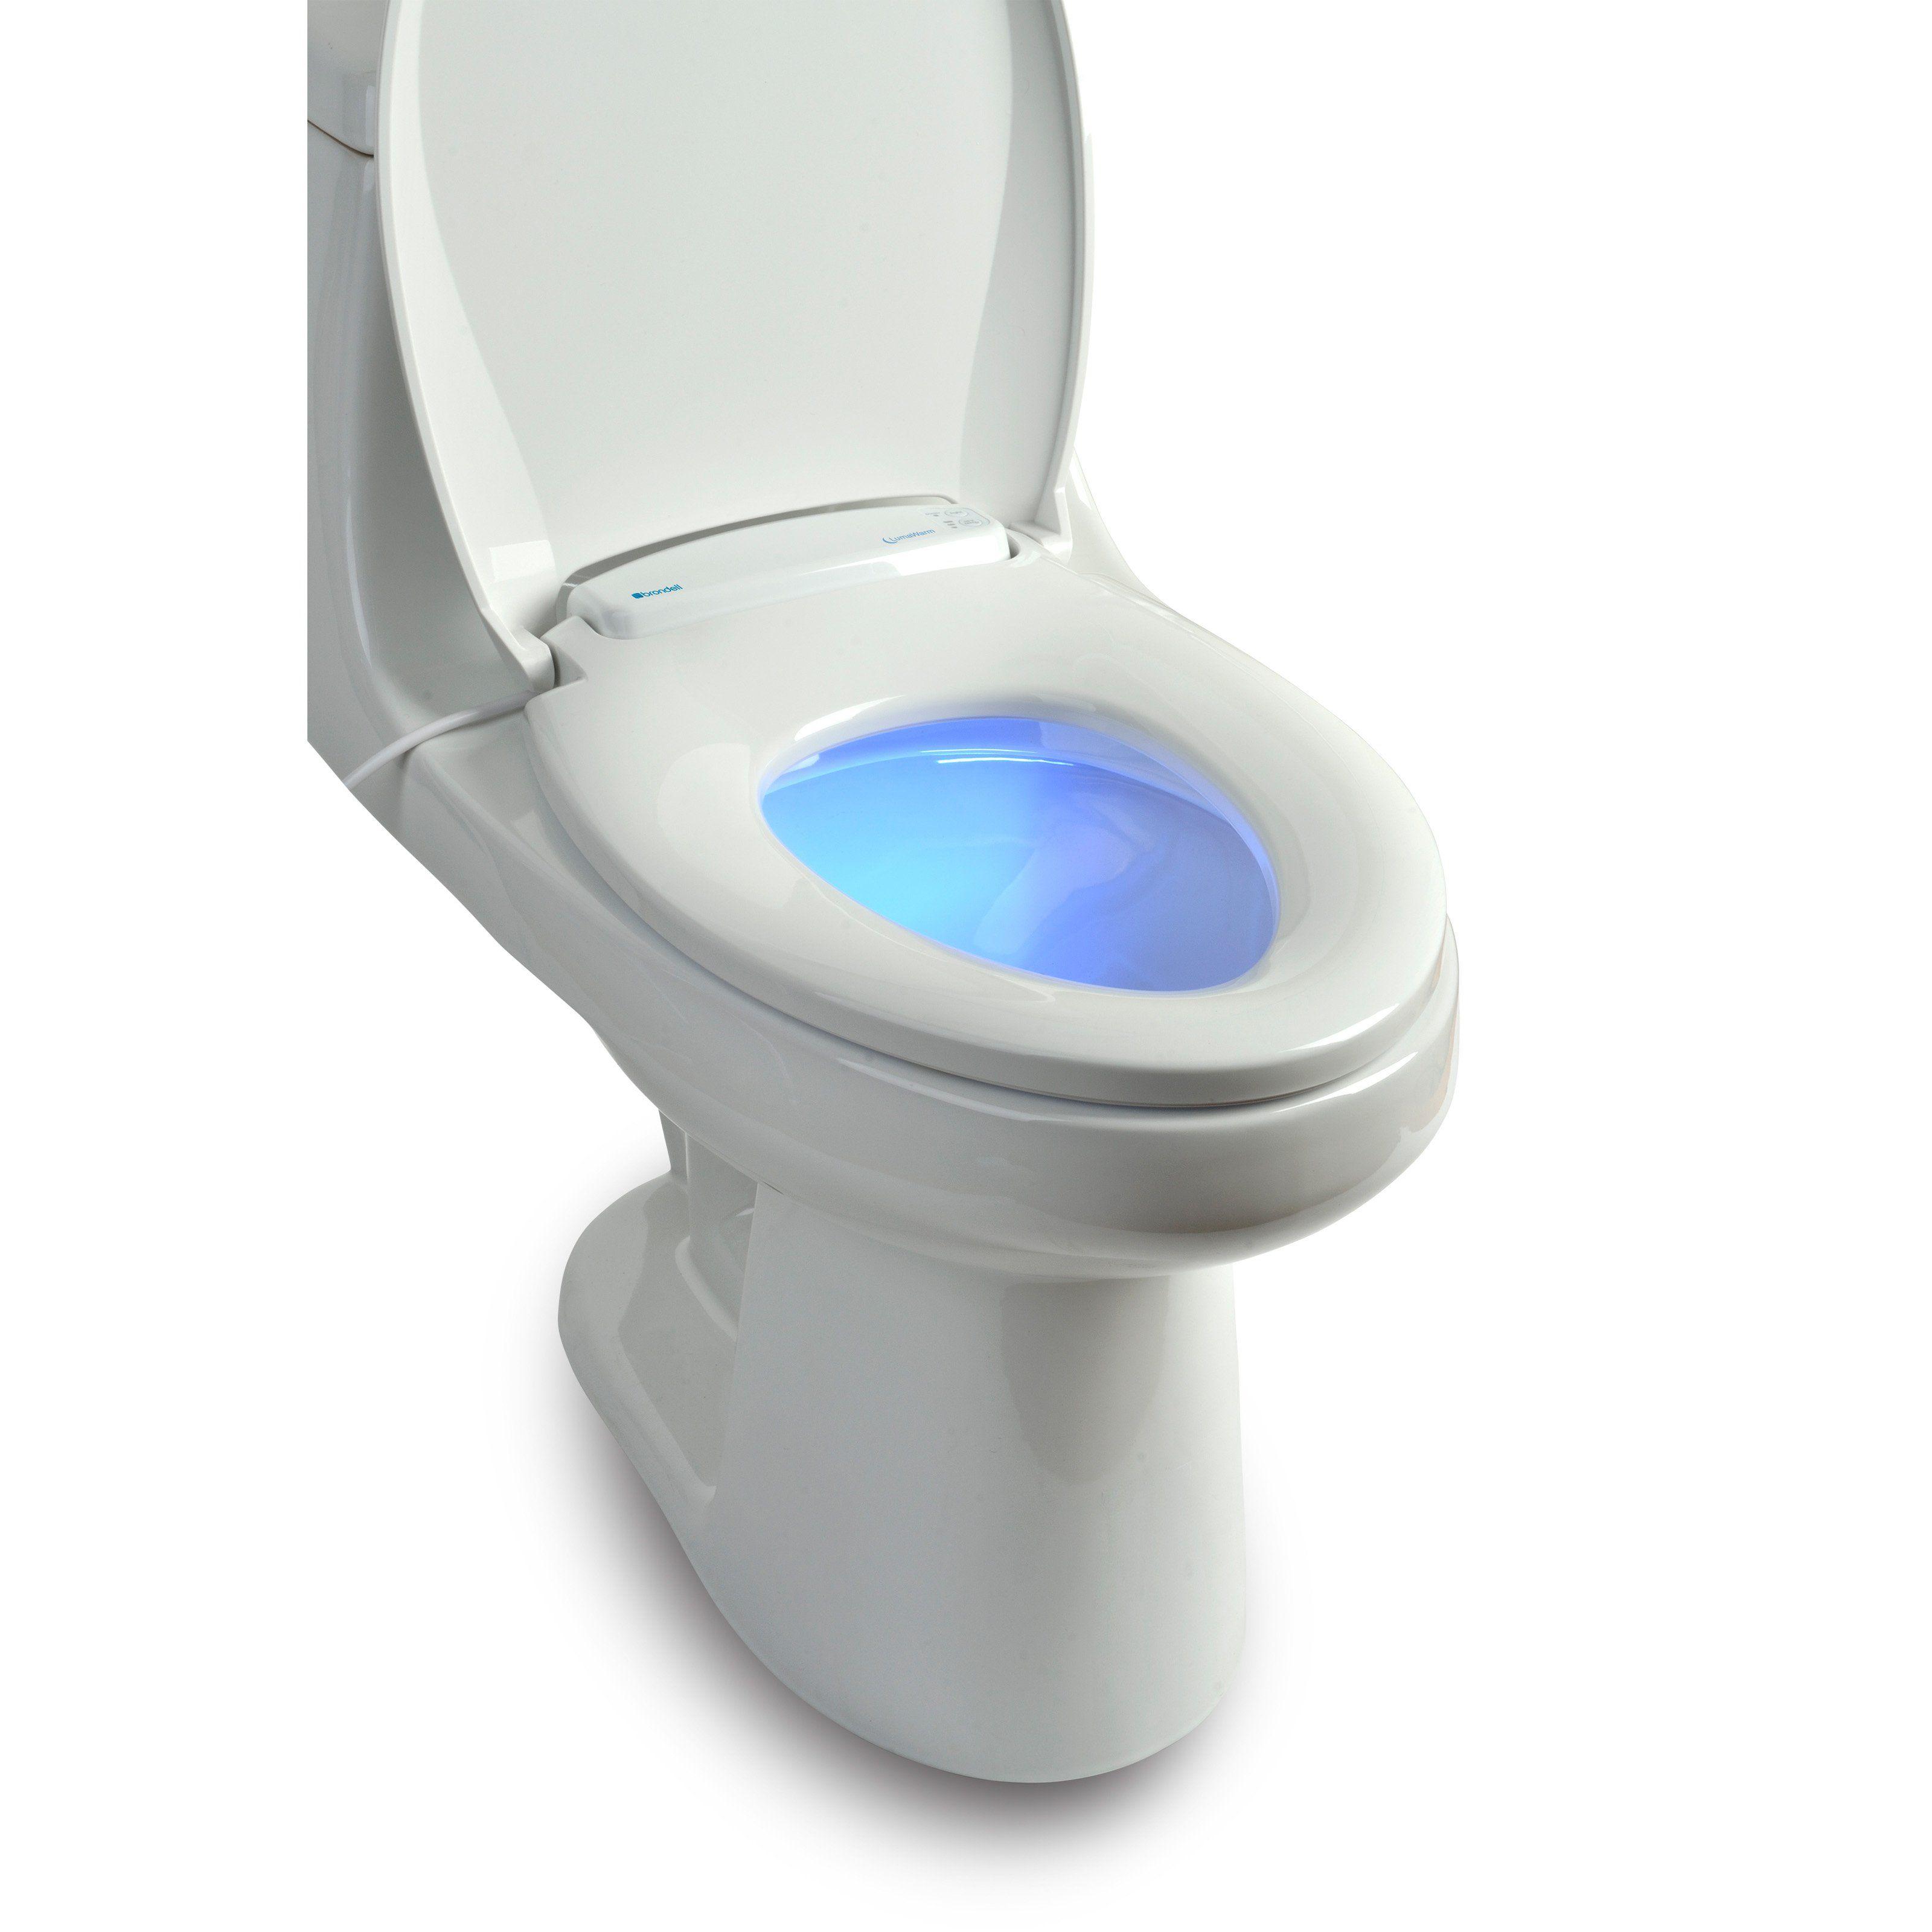 Brondell Lumawarm Heated Nightlight Toilet Seat L60 Ew Toilet